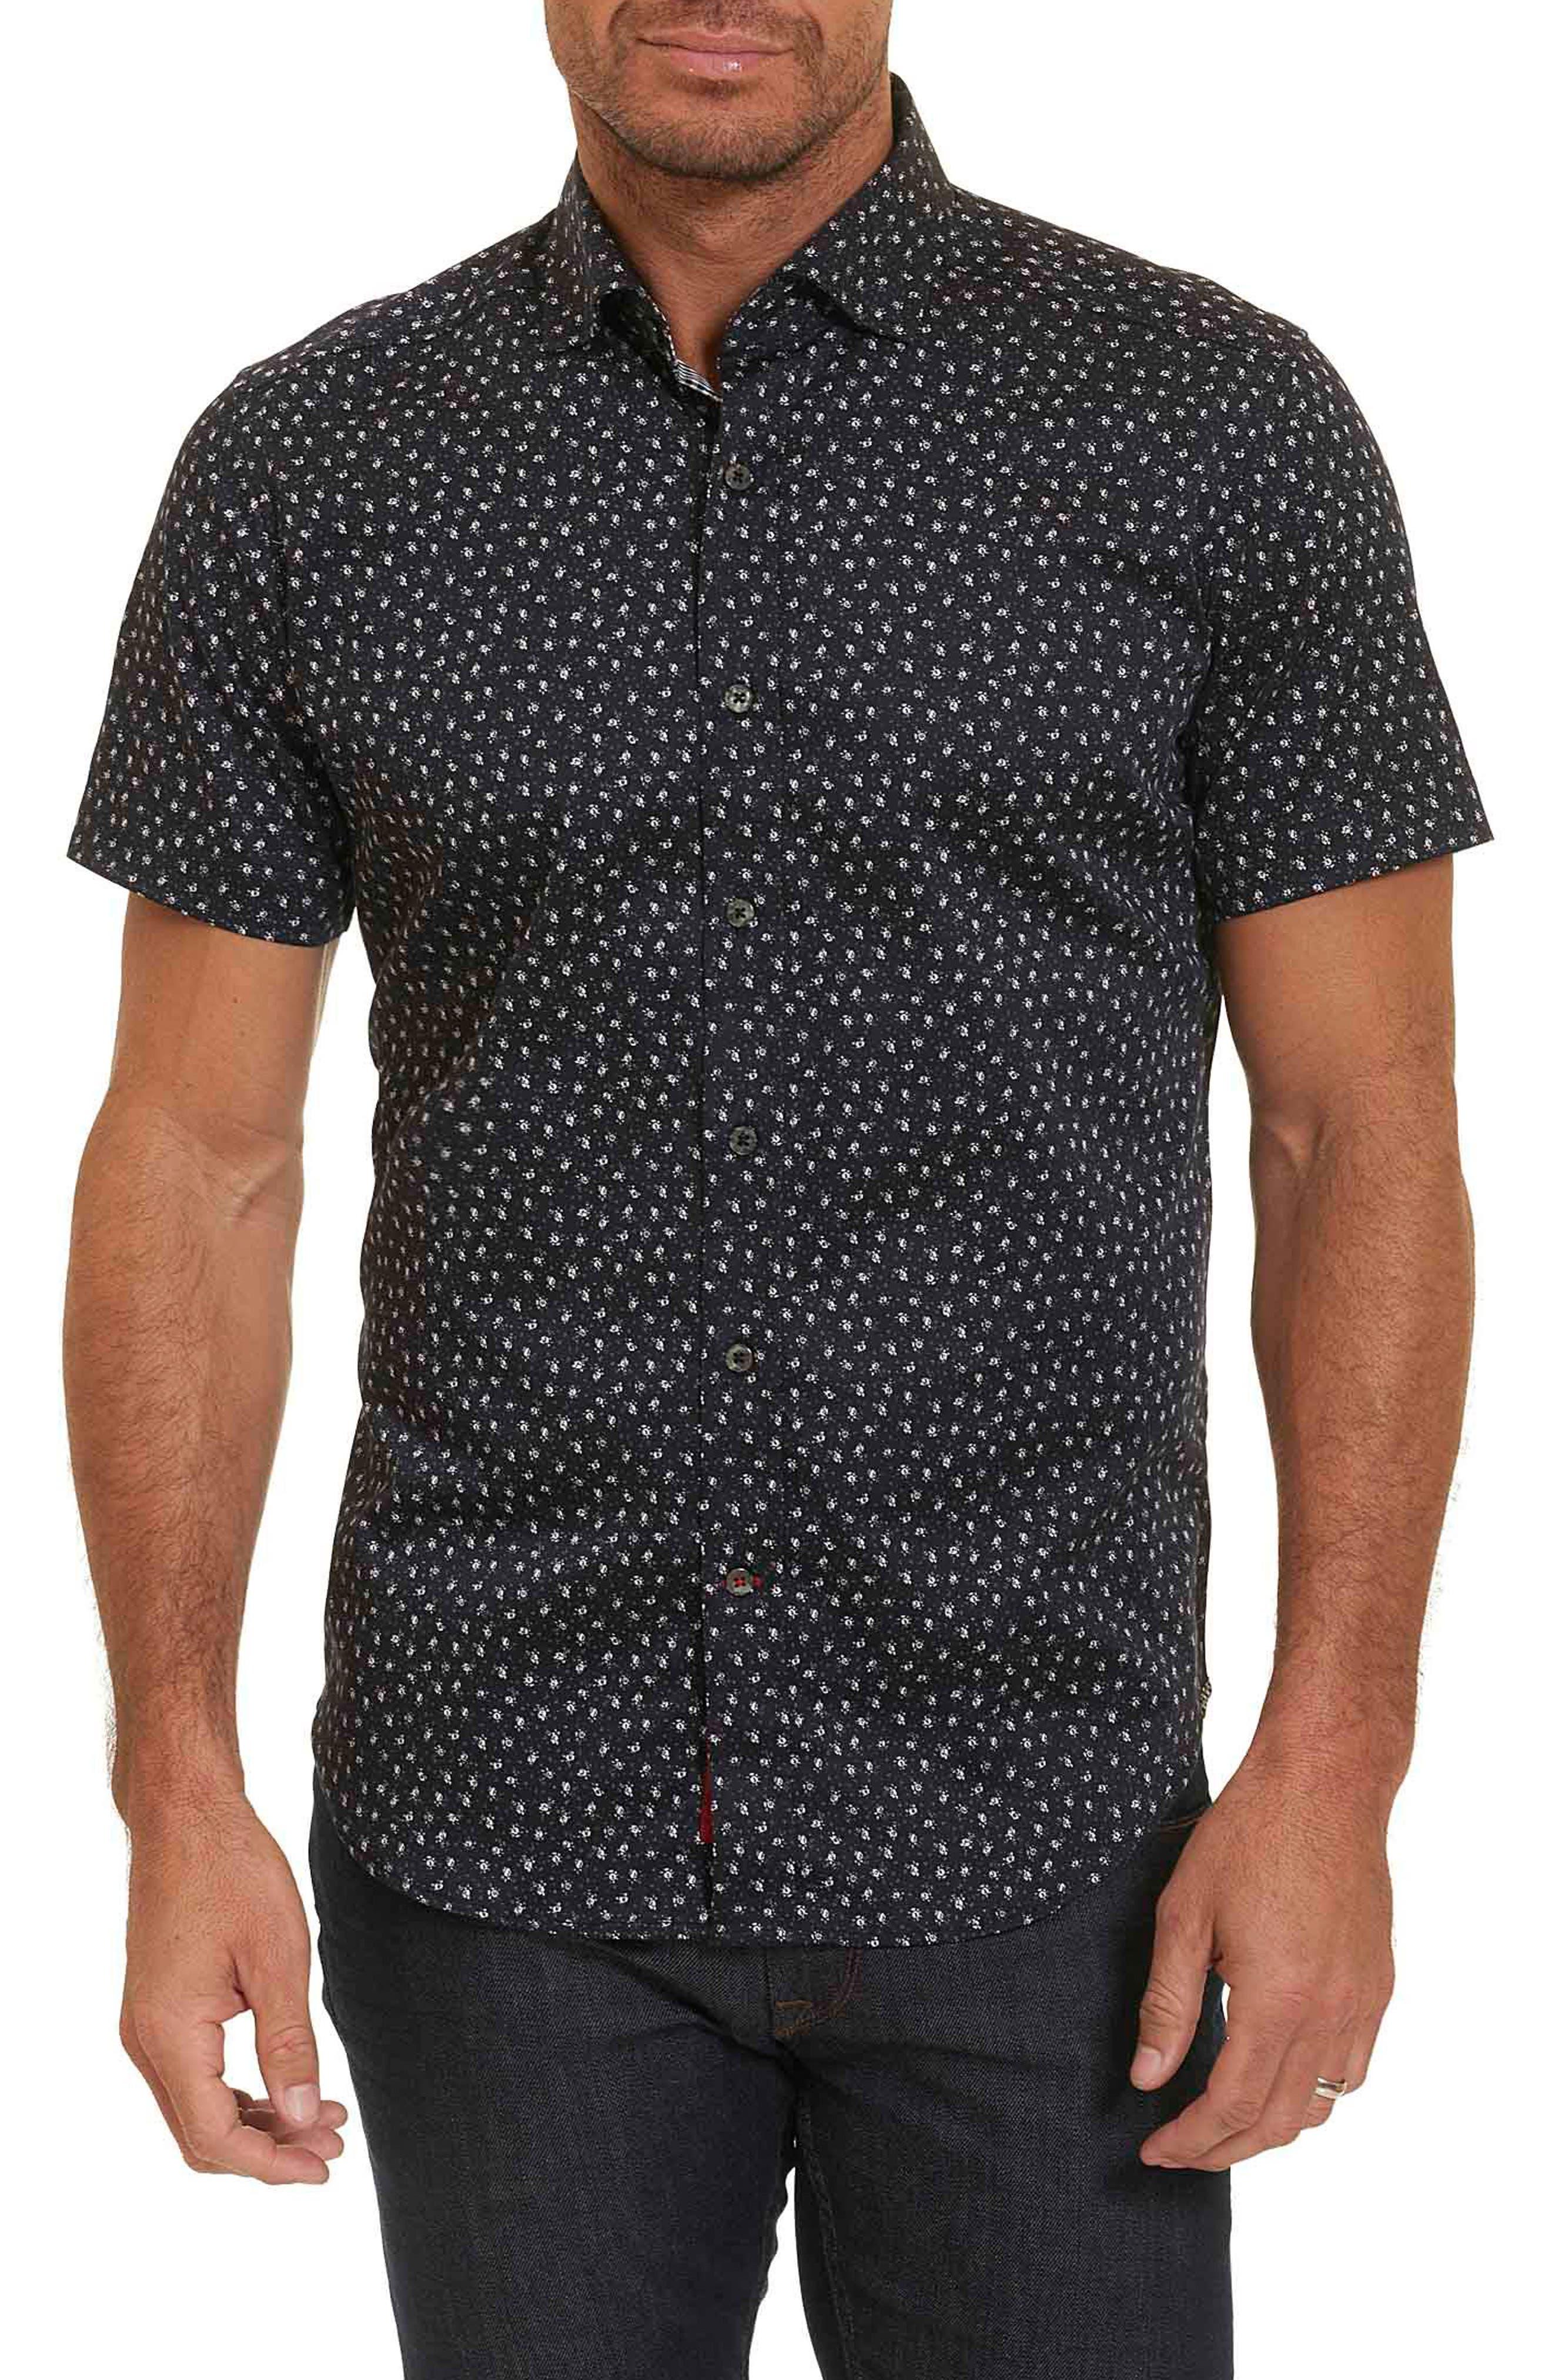 Main Image - Robert Graham Miki Tailored Fit Print Short Sleeve Sport Shirt